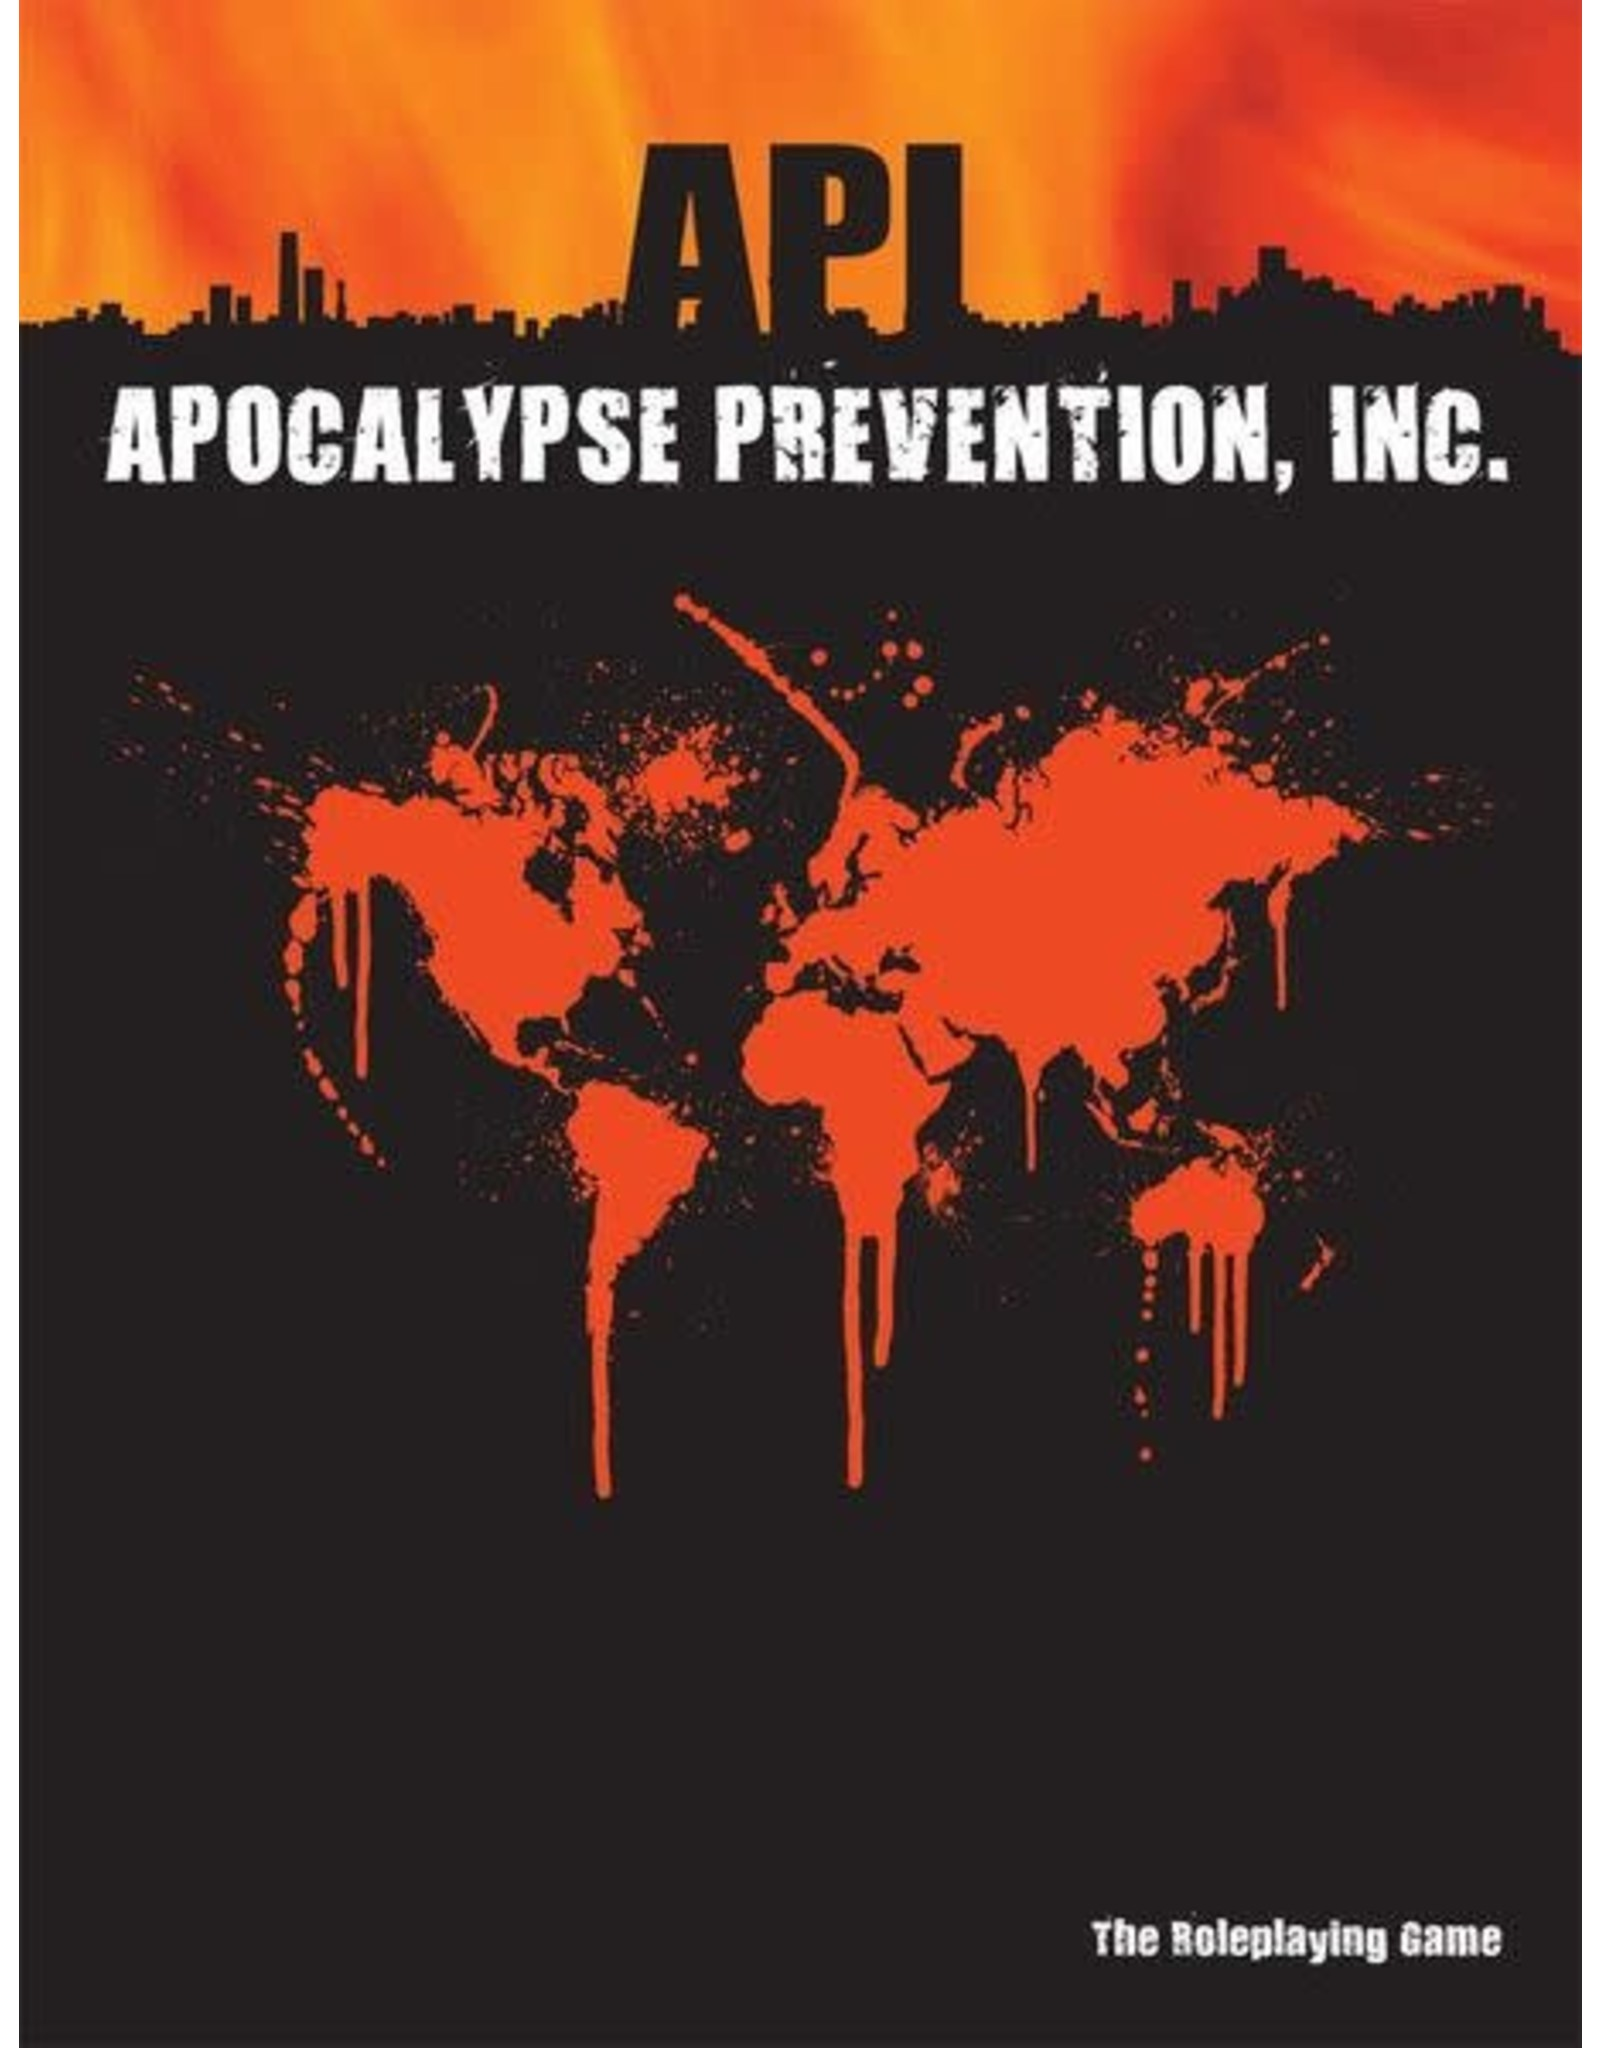 Third Eye Games Apocolypse Prevention, Inc.: Core Rulebook